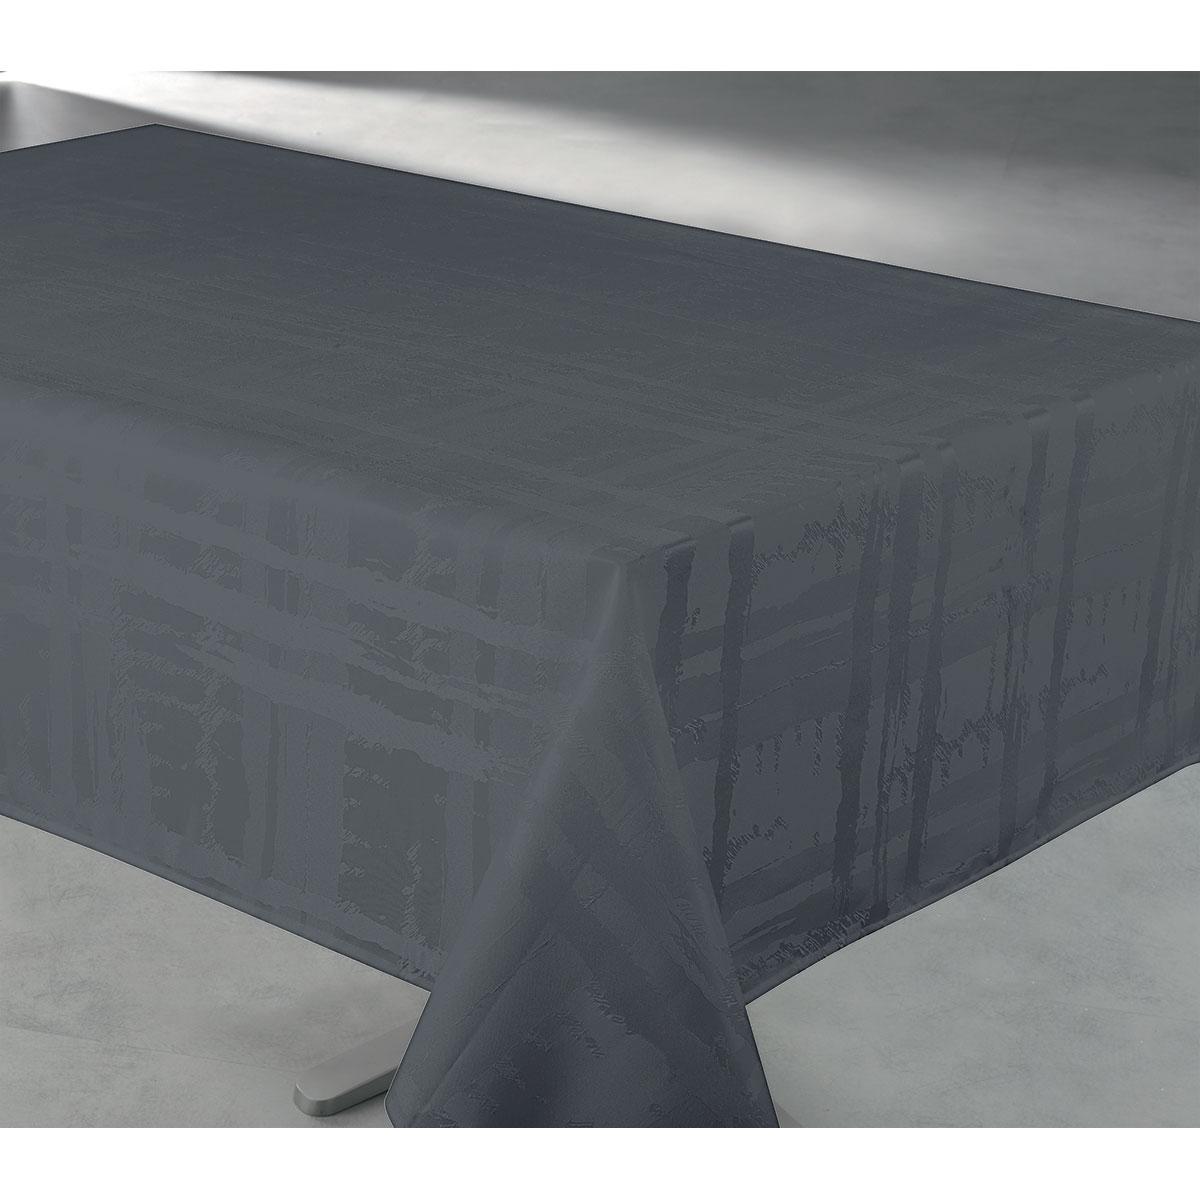 Nappe en tissu jacquard anti tache - Anthracite - 145 x 240 cm